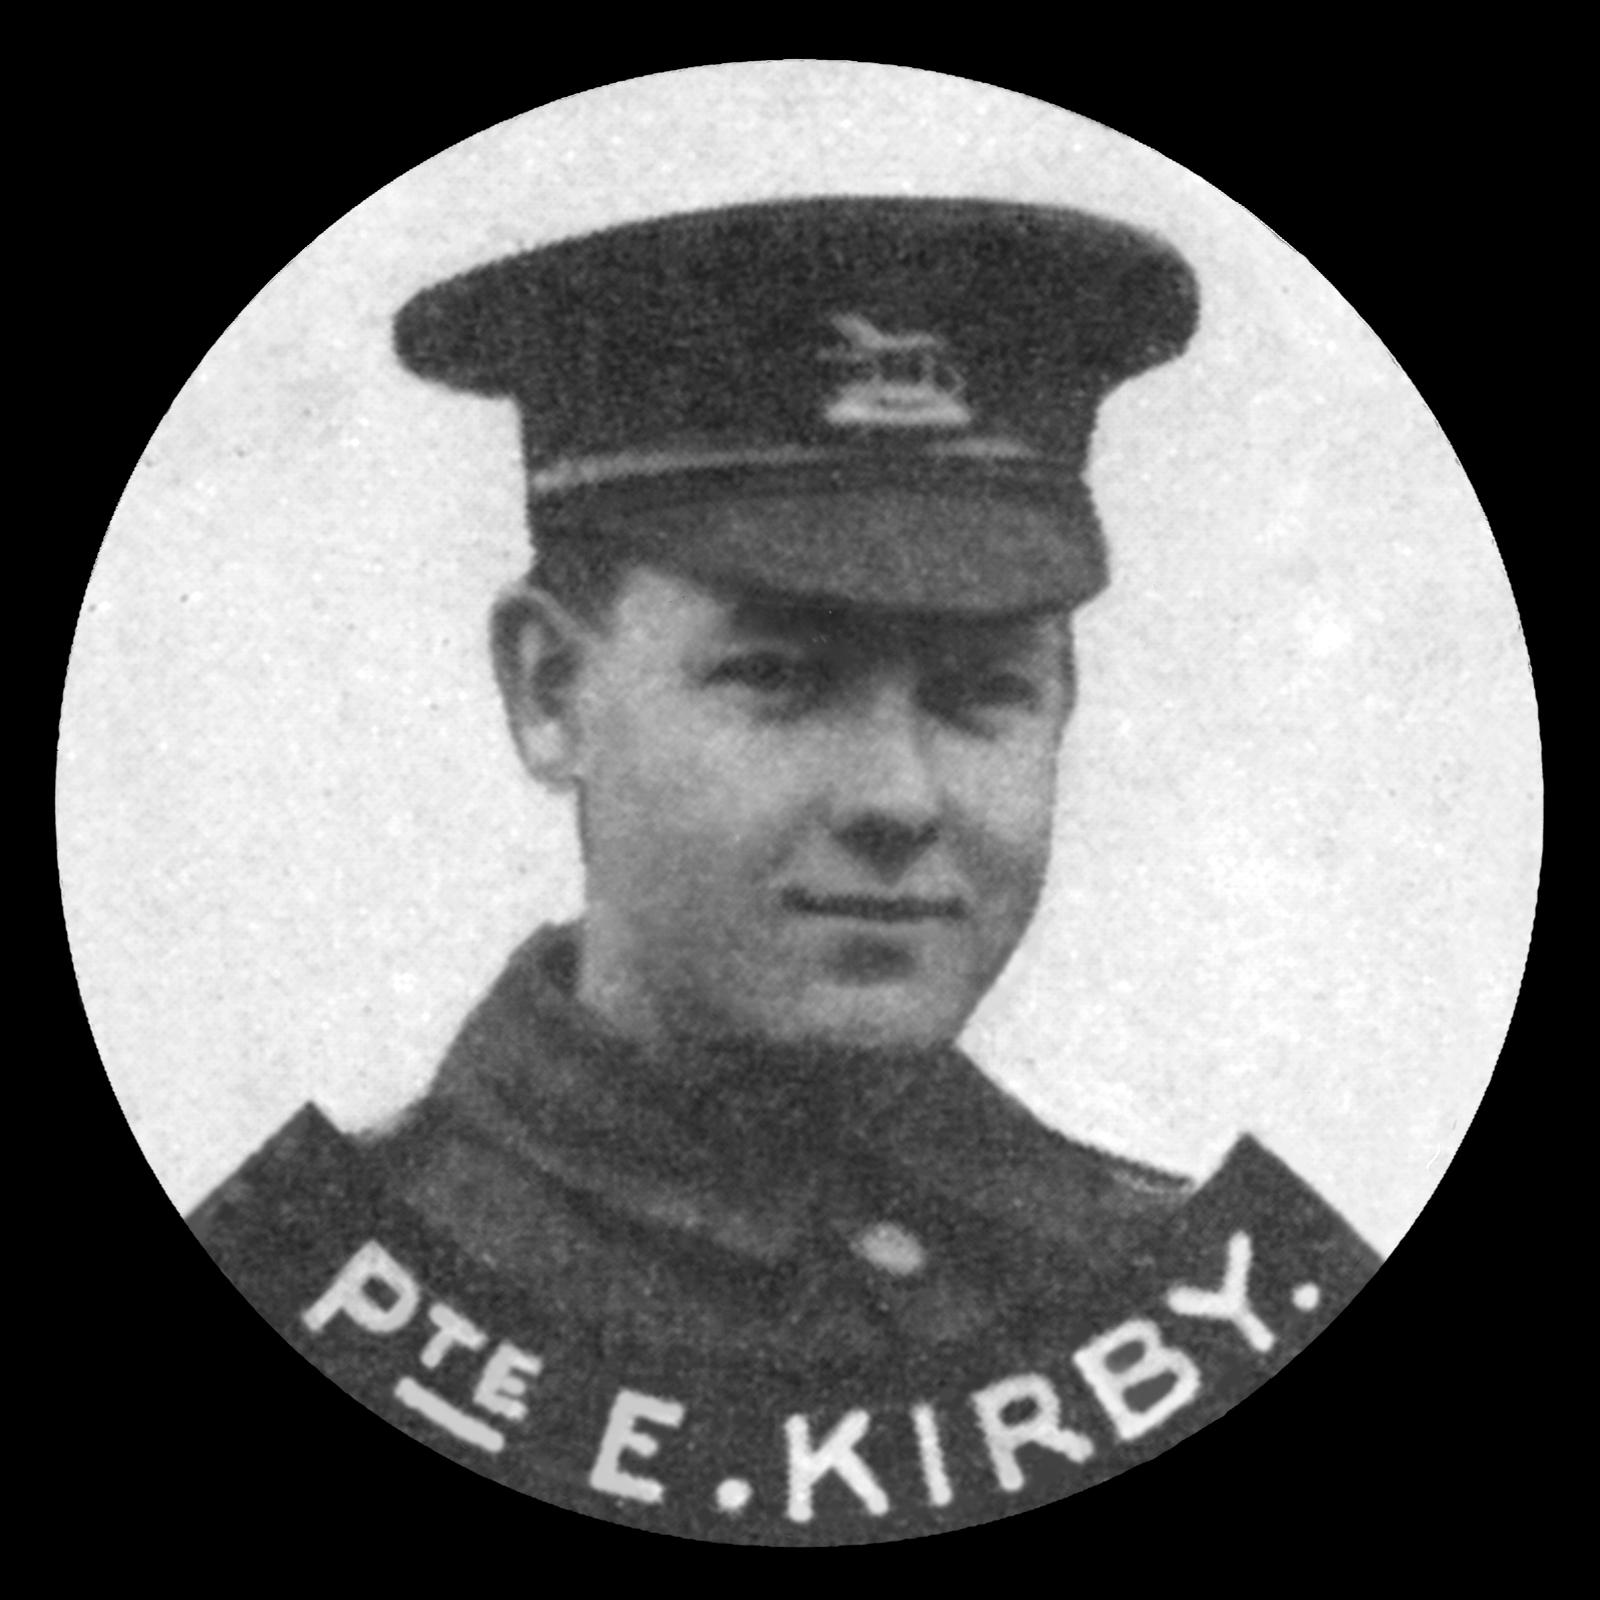 KIRBY Ernest